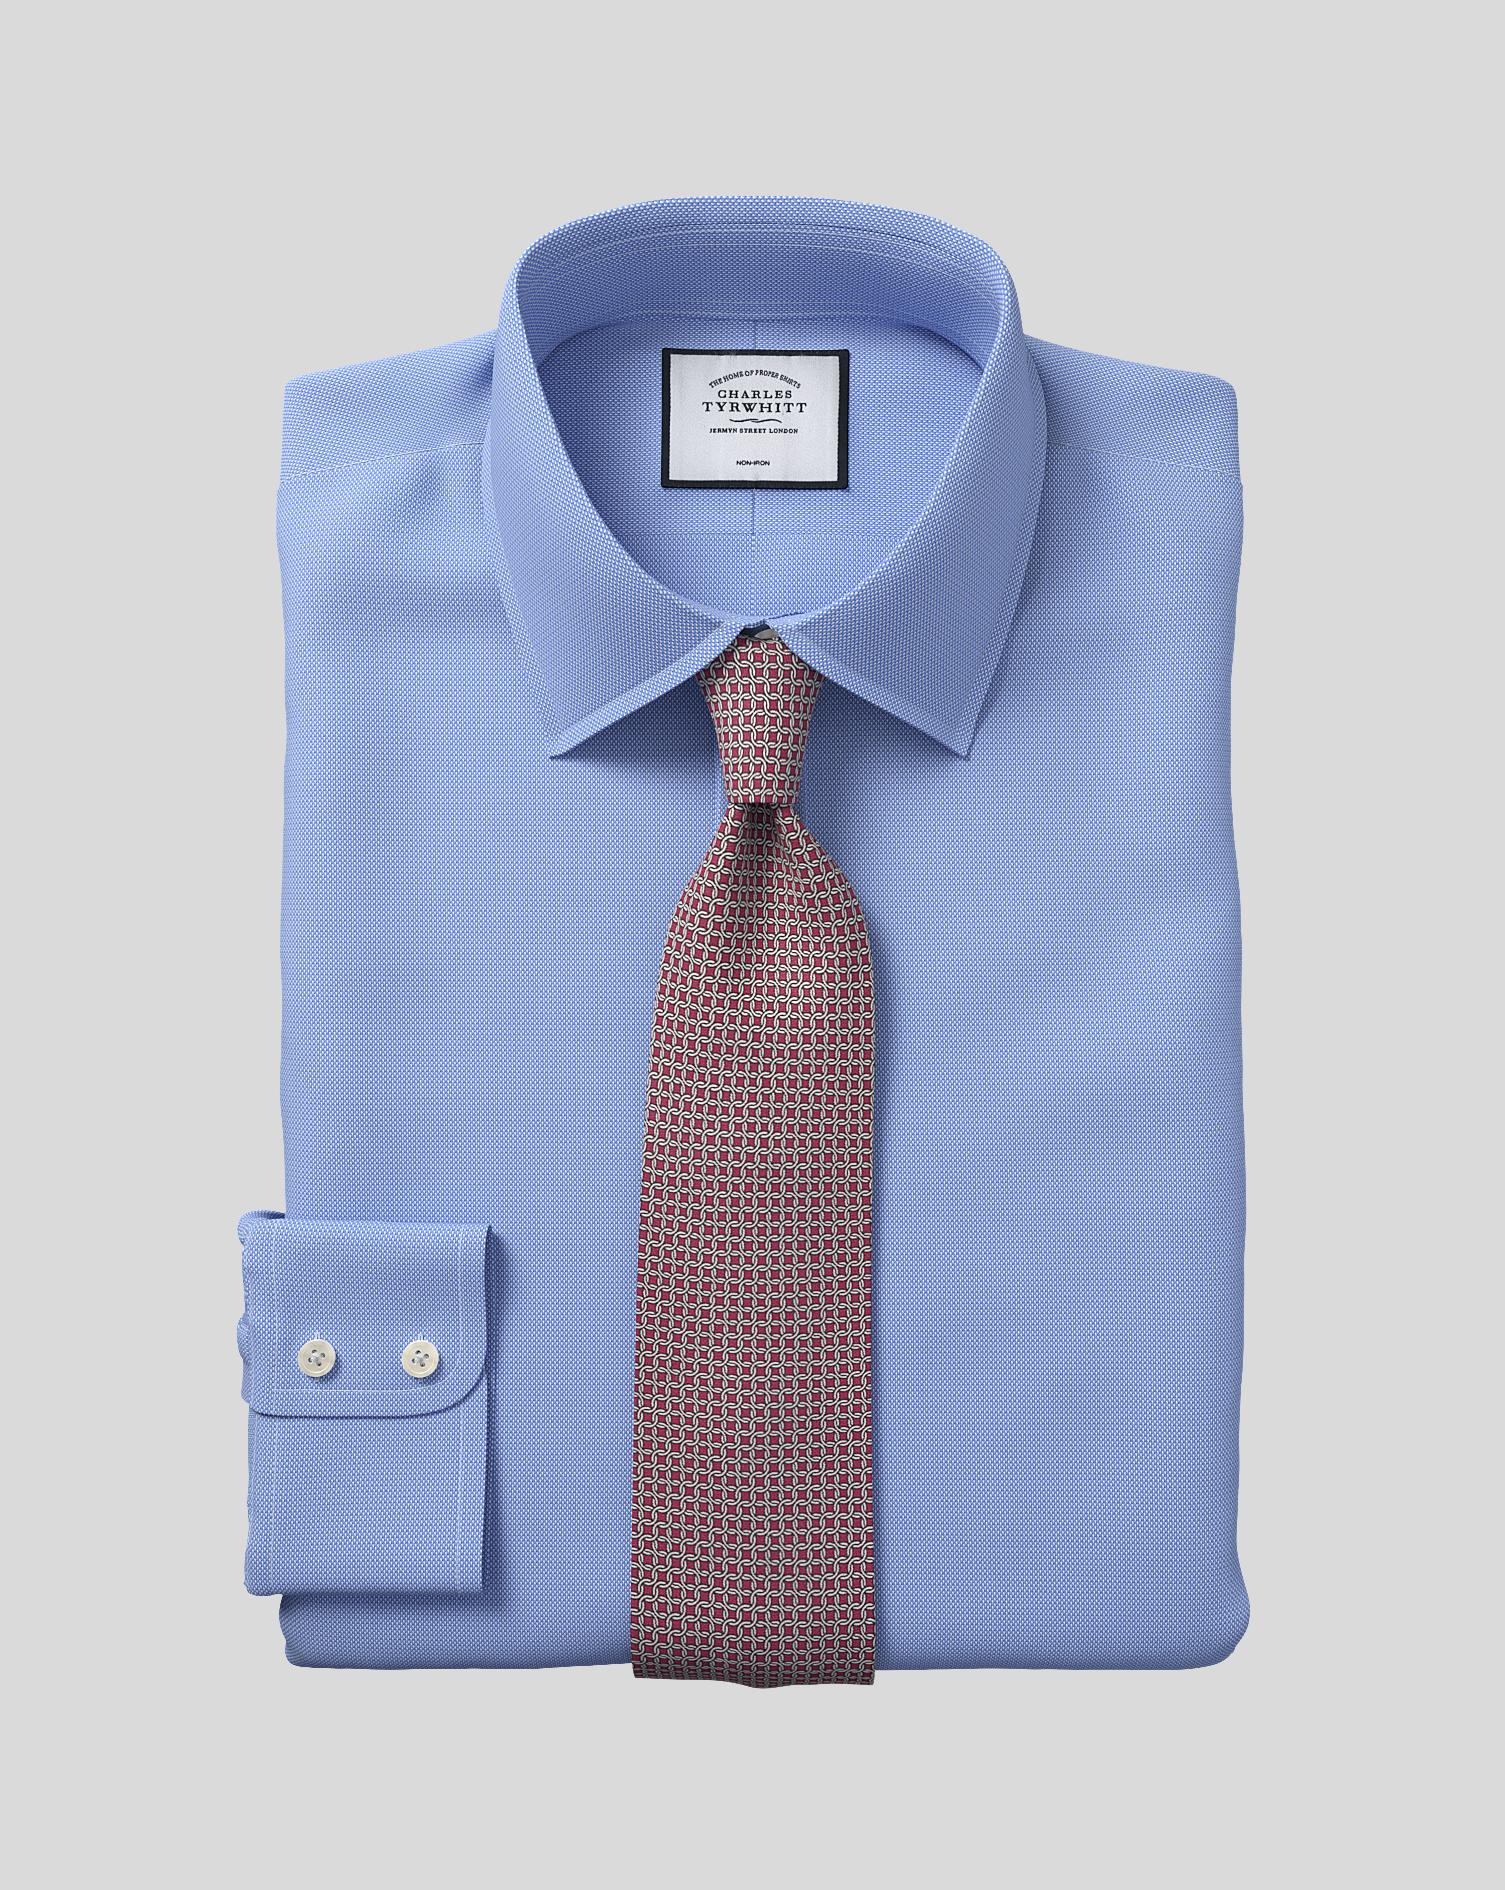 Cotton Classic Fit Non-Iron Blue Royal Panama Shirt